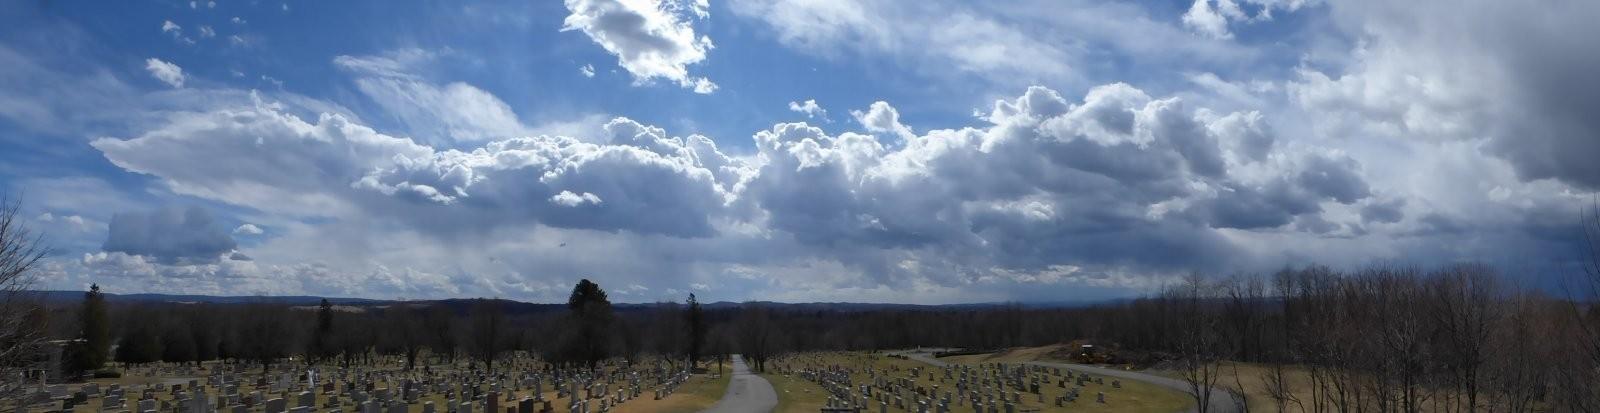 FZ200 Oakwood and St. Mary cemetery skies 032.JPG